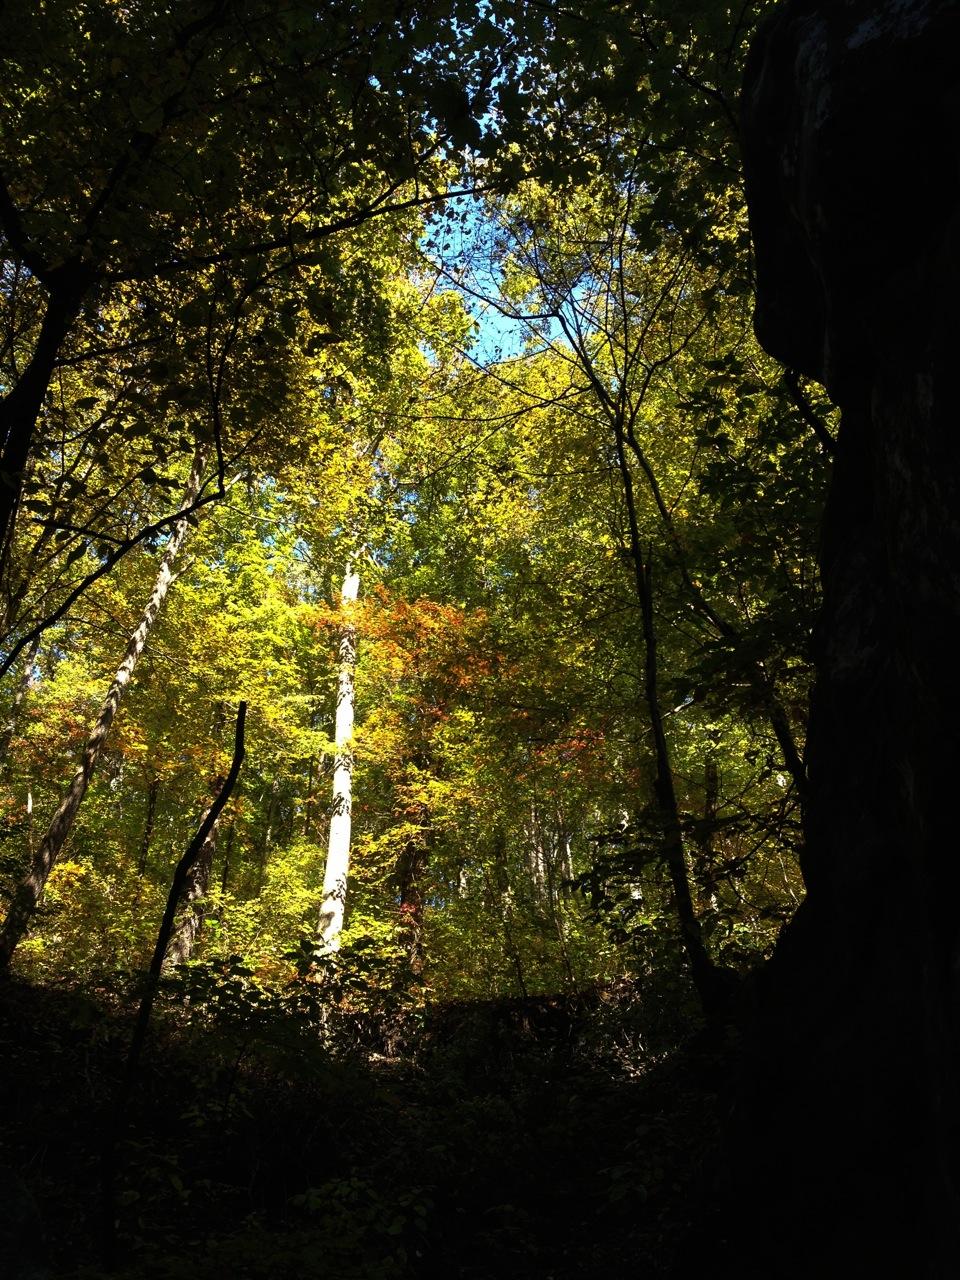 trees-in-dayton.jpg